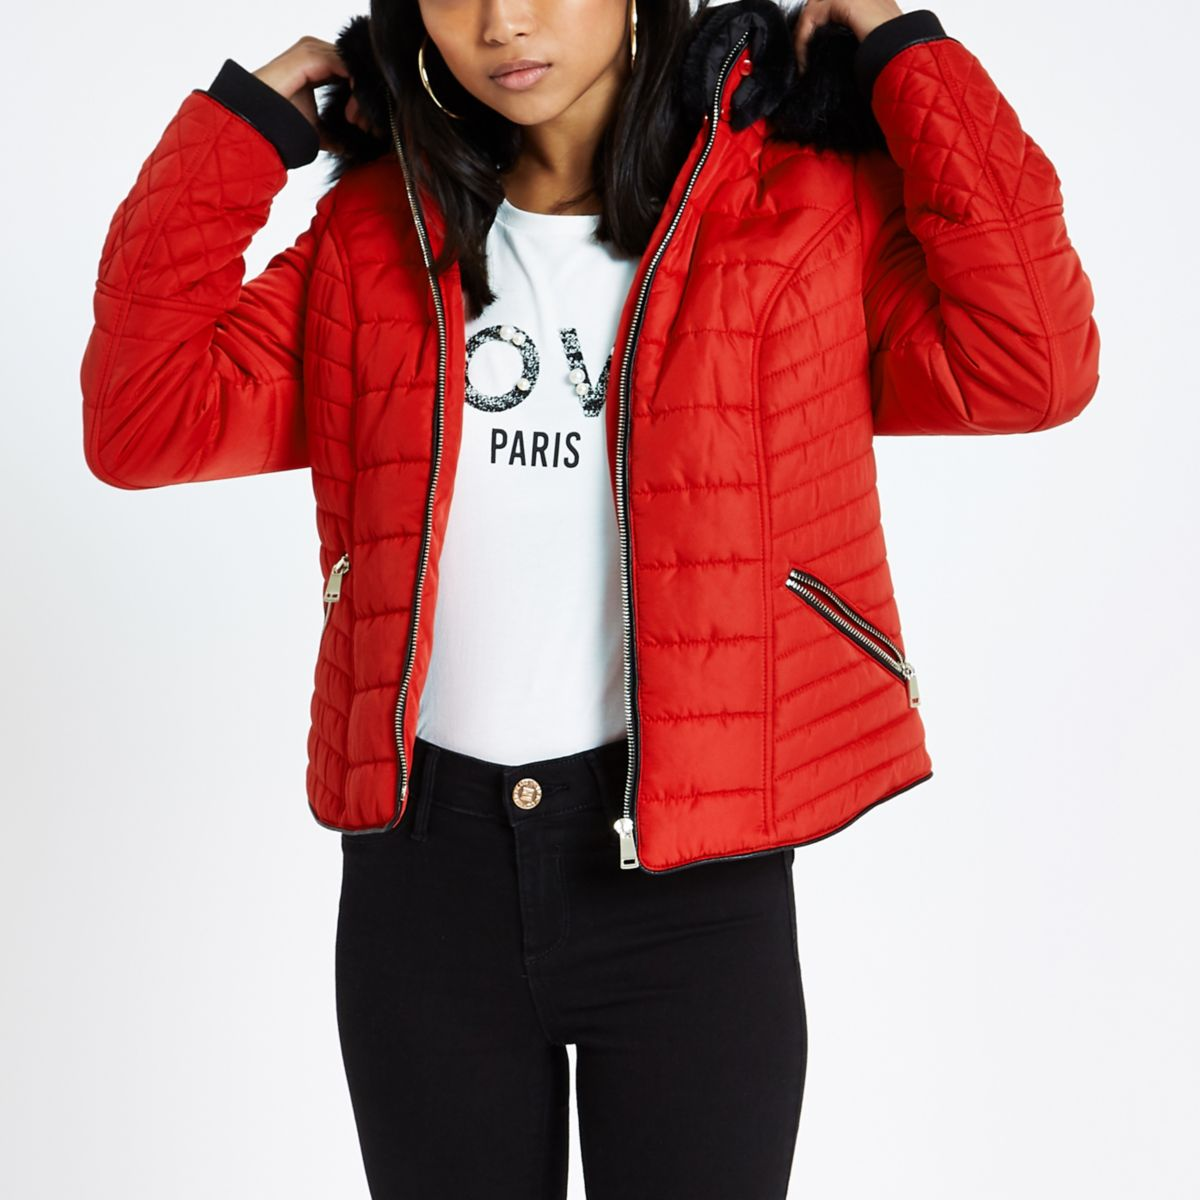 Petite Red Fur Hood Long Sleeve Padded Jacket Jackets Coats